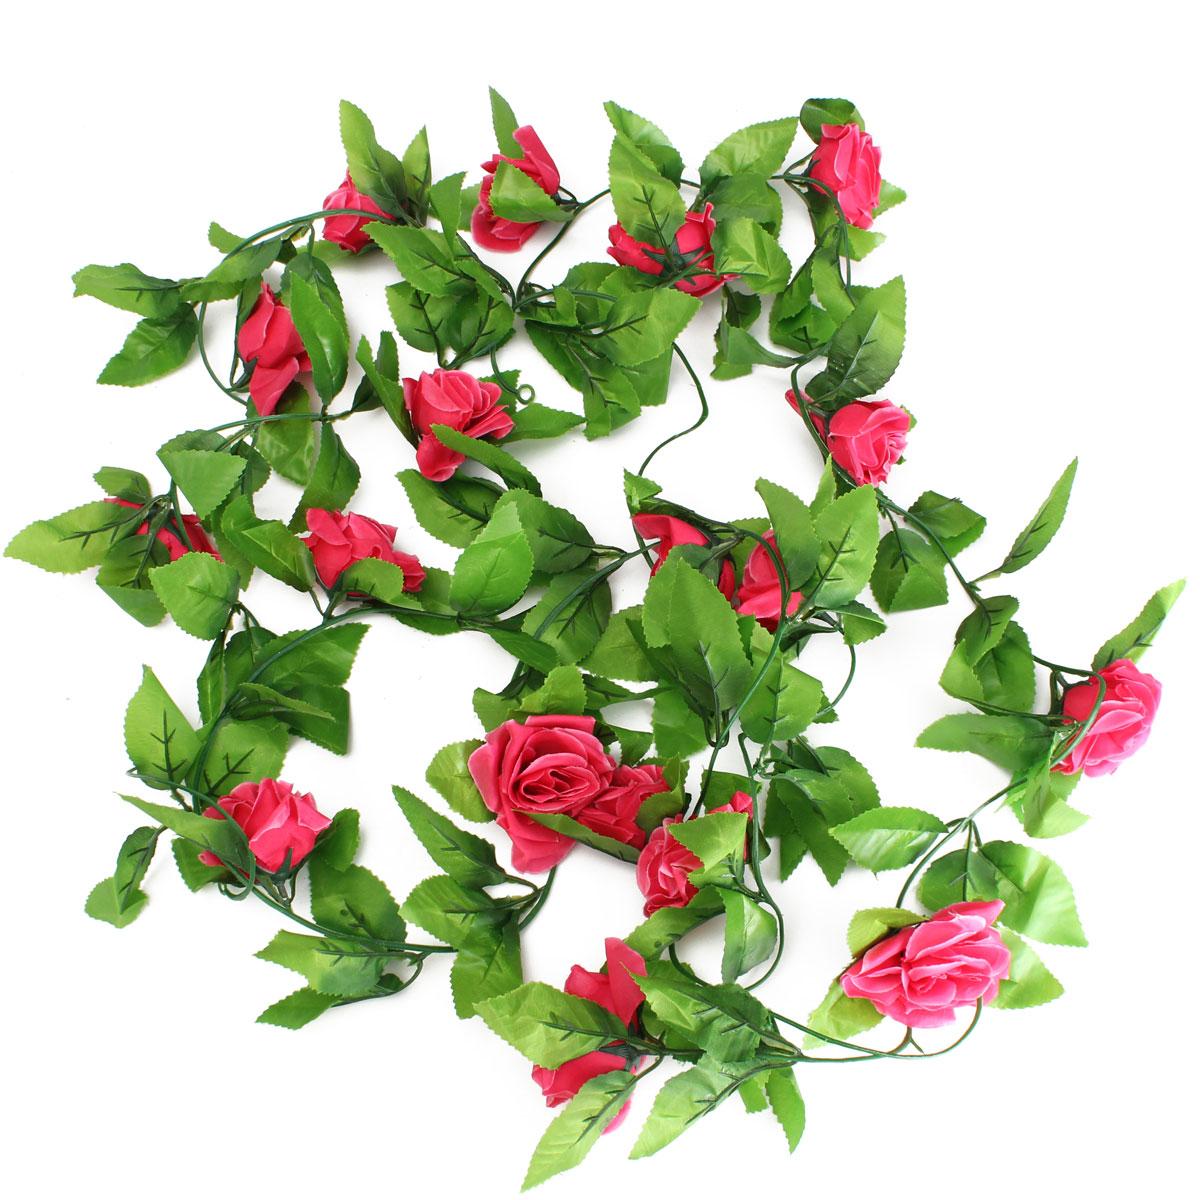 seidenblumen efeuranke blumenranke rosen kunstblumen blumen girlande ranken ebay. Black Bedroom Furniture Sets. Home Design Ideas